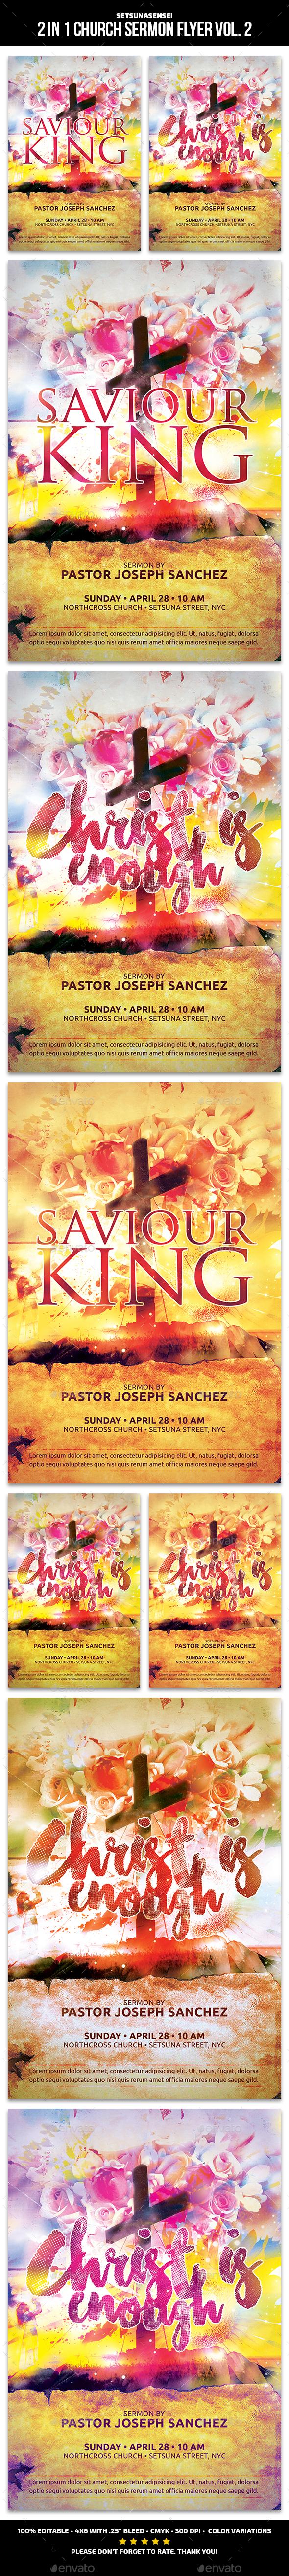 2 in 1 Church Sermon Flyer Vol. 2 - Church Flyers